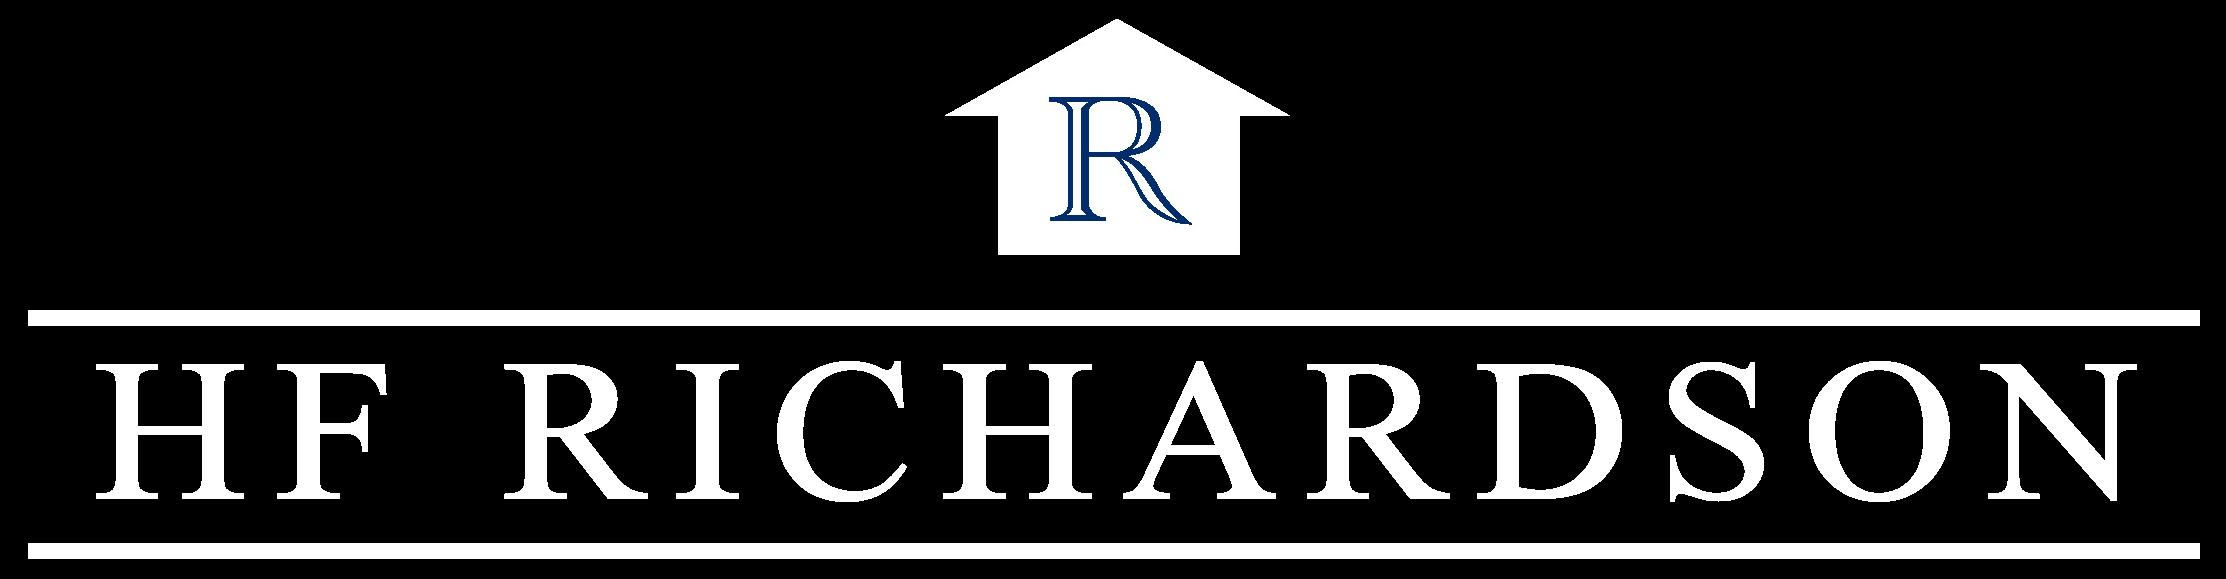 Agency logo - HF Richardson